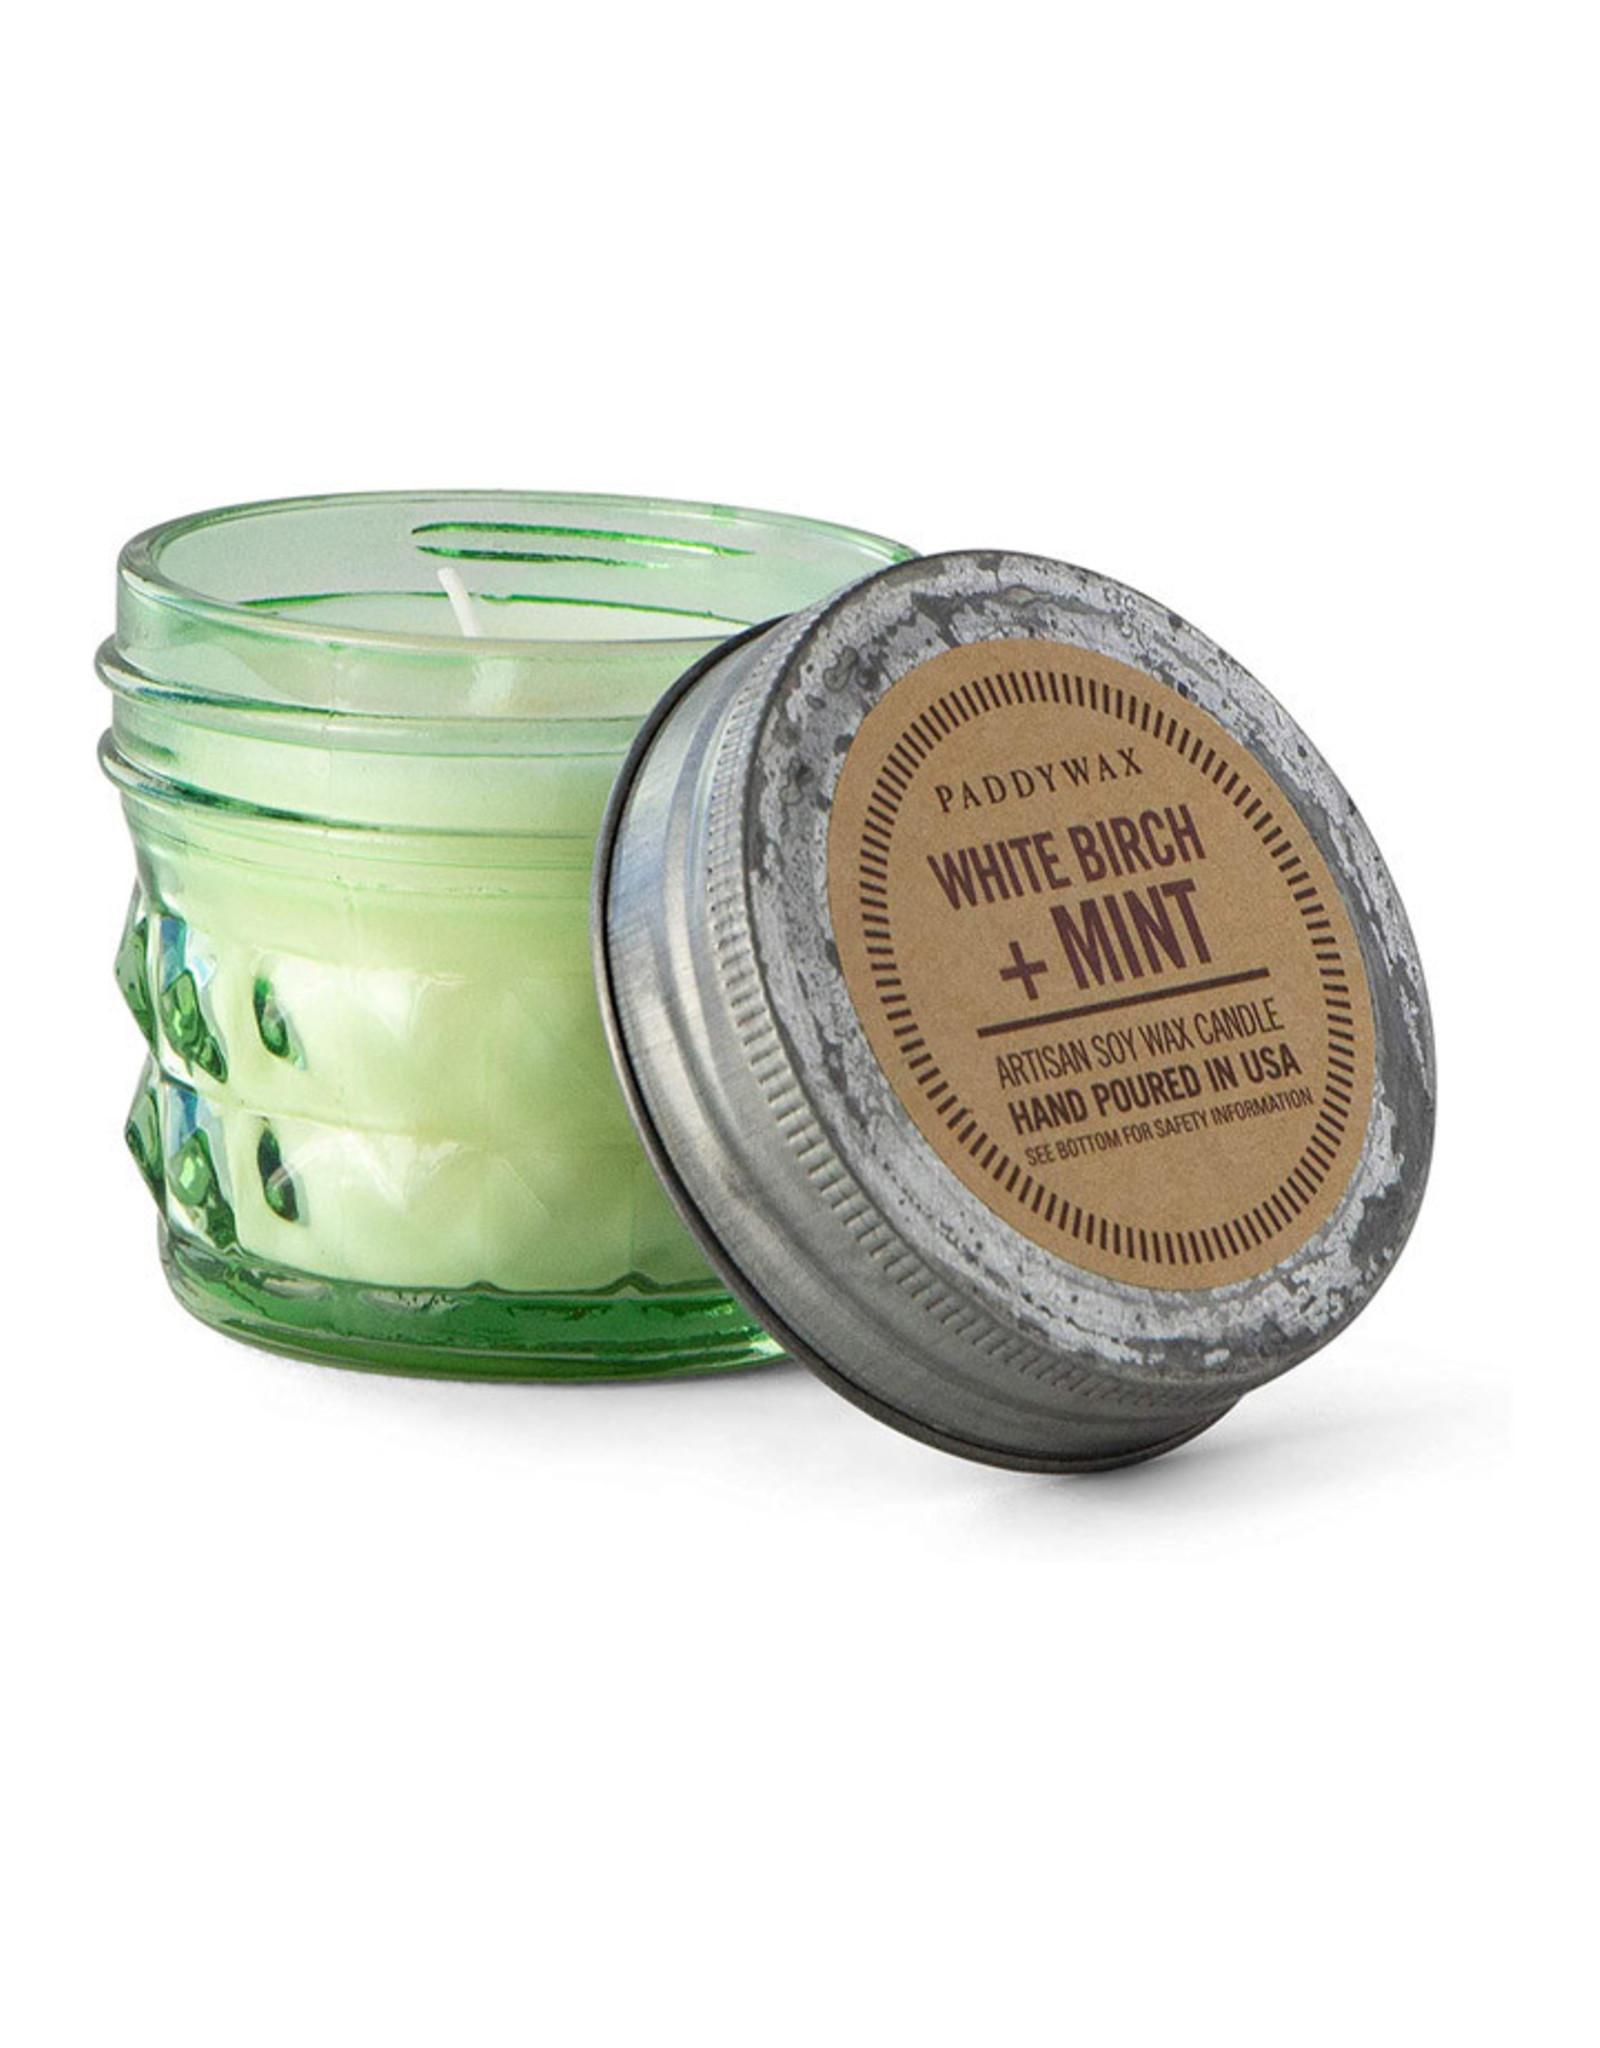 Paddywax Relish Jar 3 oz candle - White Birch & Mint